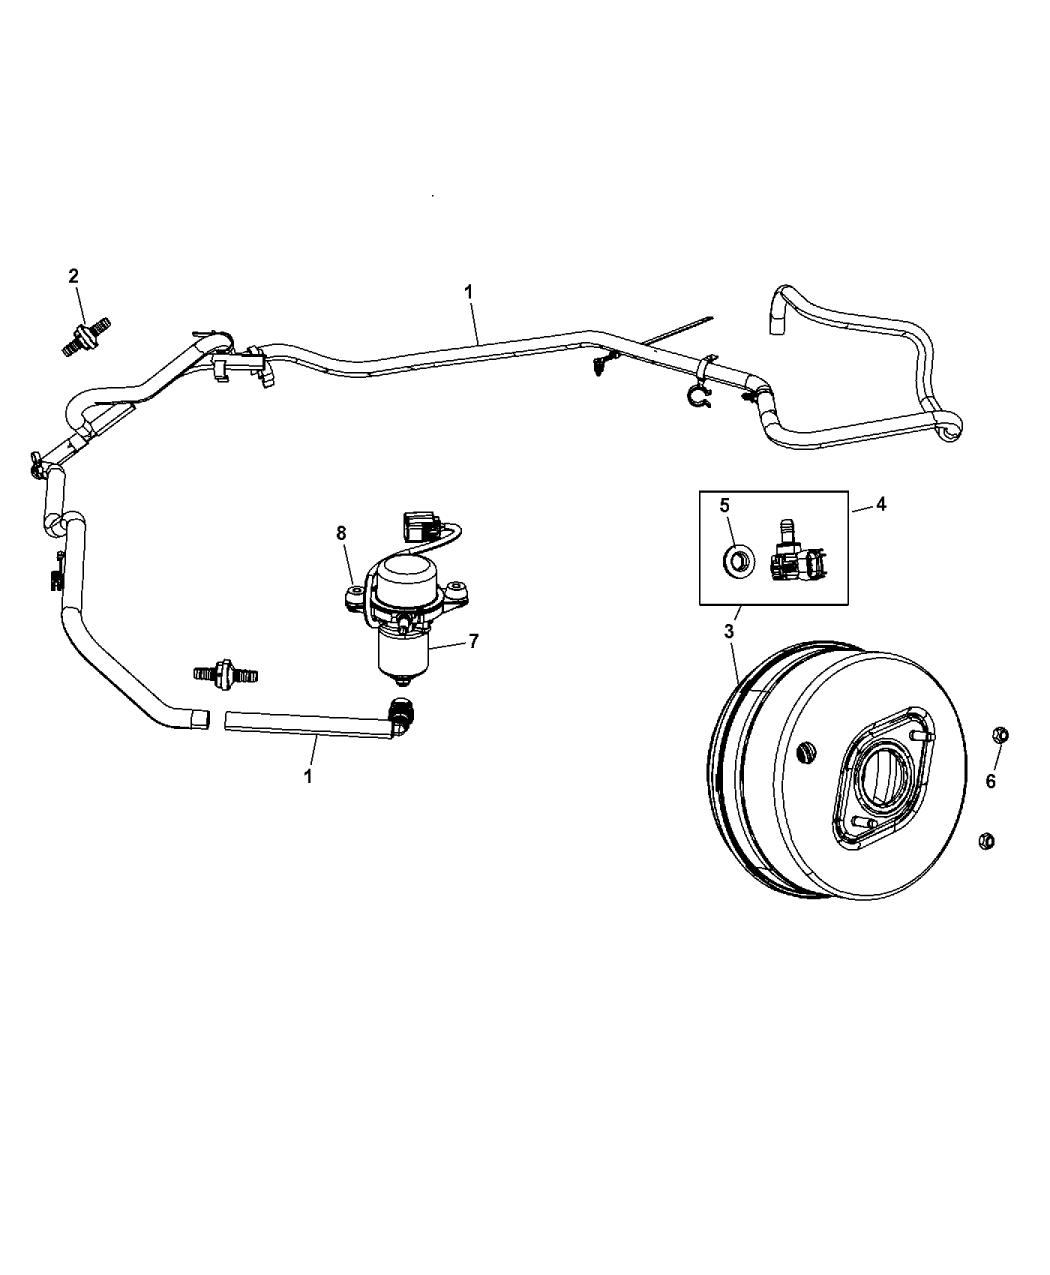 Marvelous 2012 Jeep Grand Cherokee Booster Pump Vacuum Power Brake Wiring 101 Ouplipimpapsstreekradiomeanderfmnl